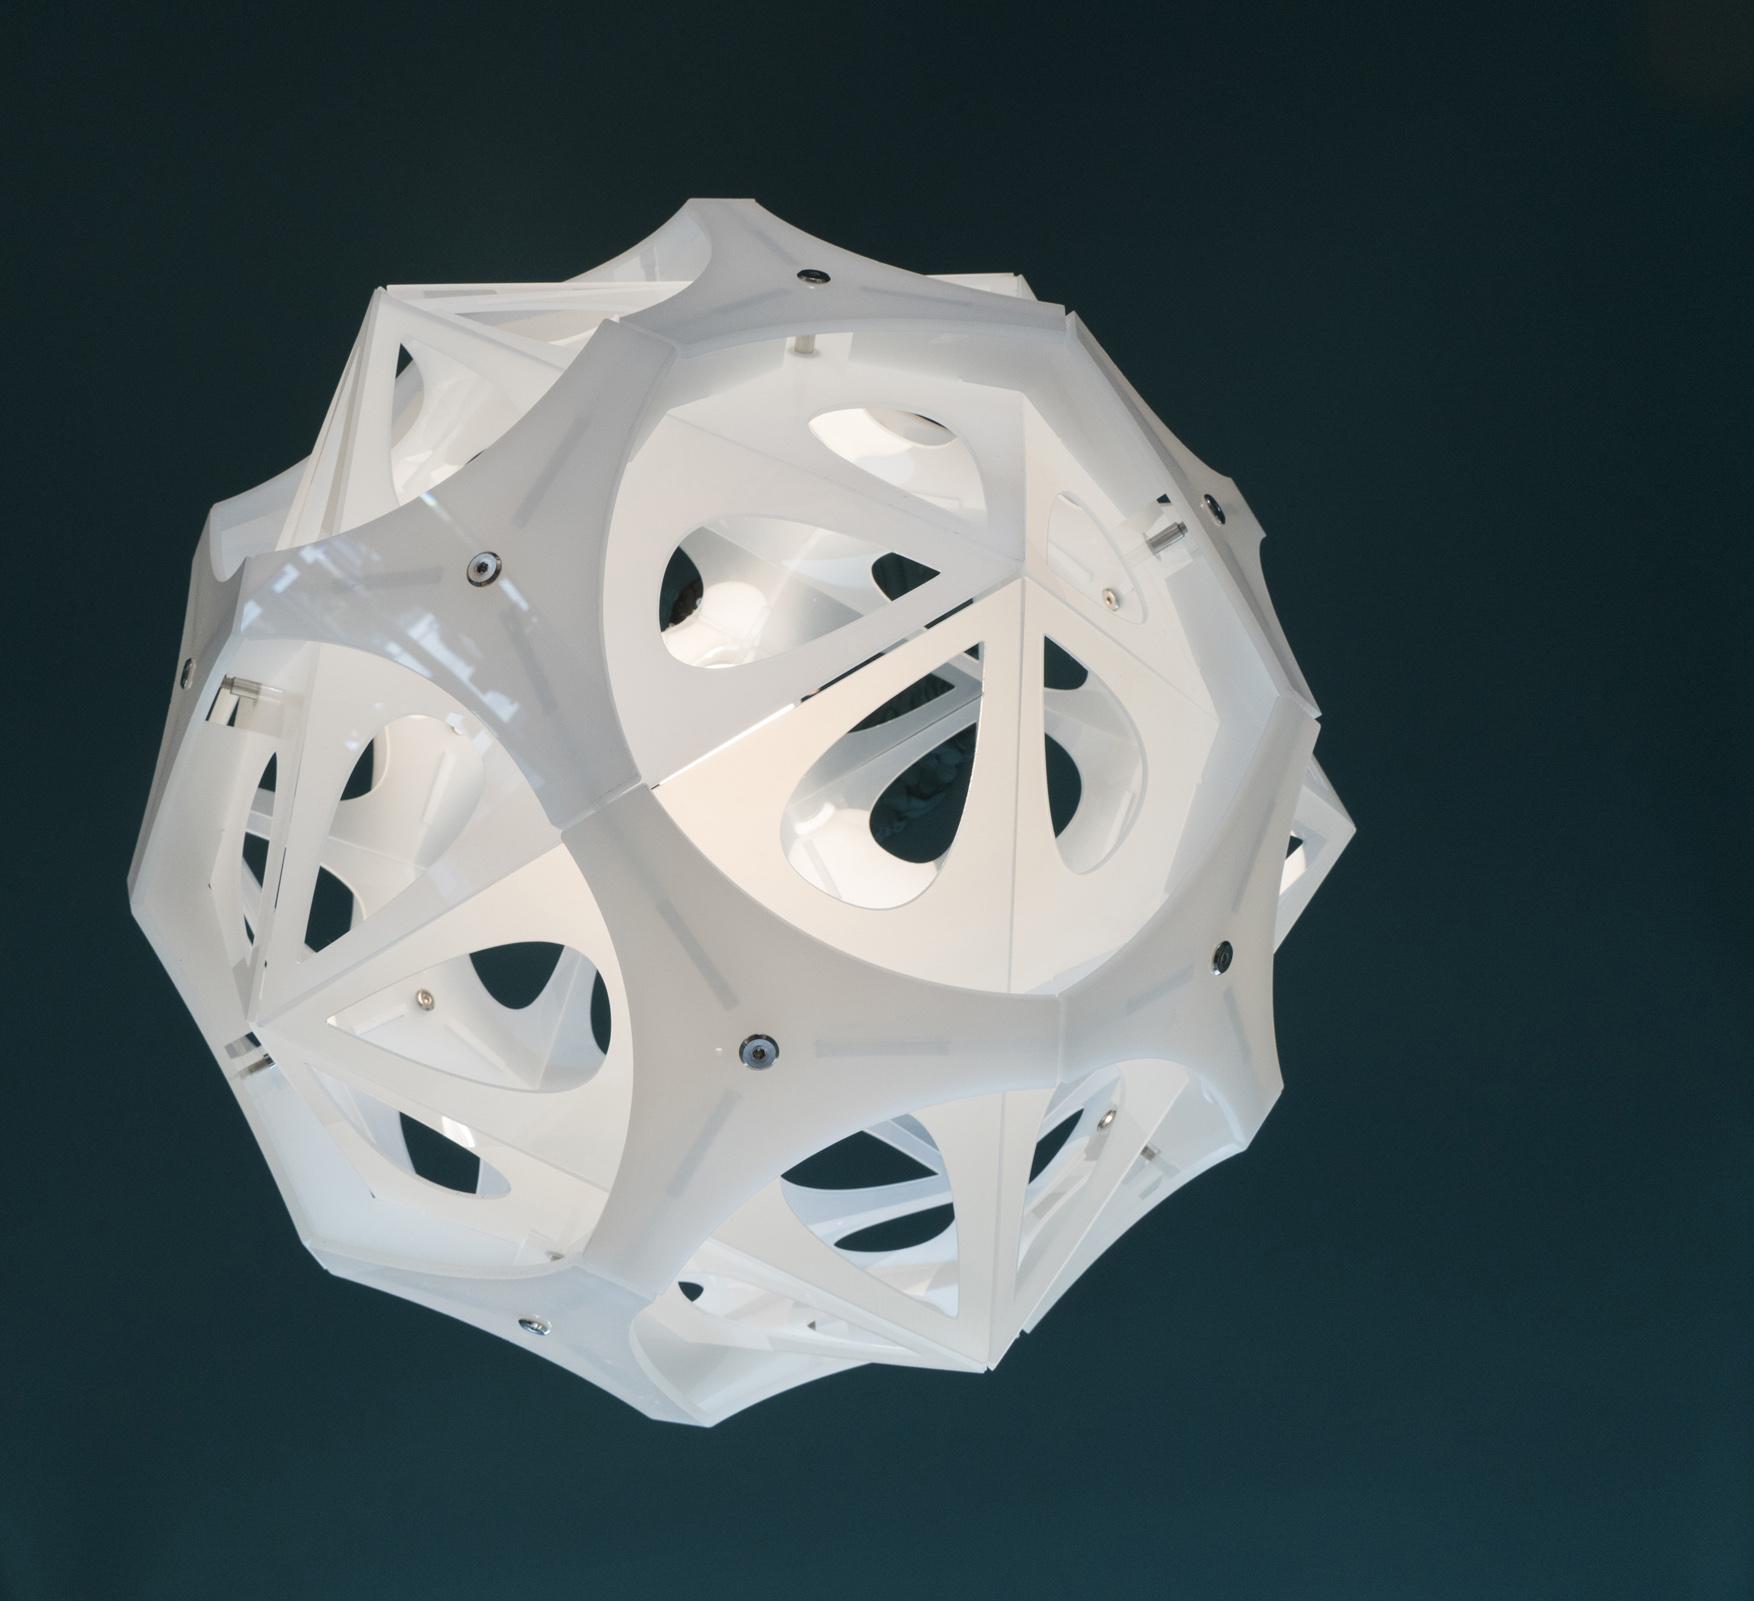 web222-lamp-link-pedro-cerisola-close-up-lit-marion-friedmann-gallery-photo-guy-hills.jpg